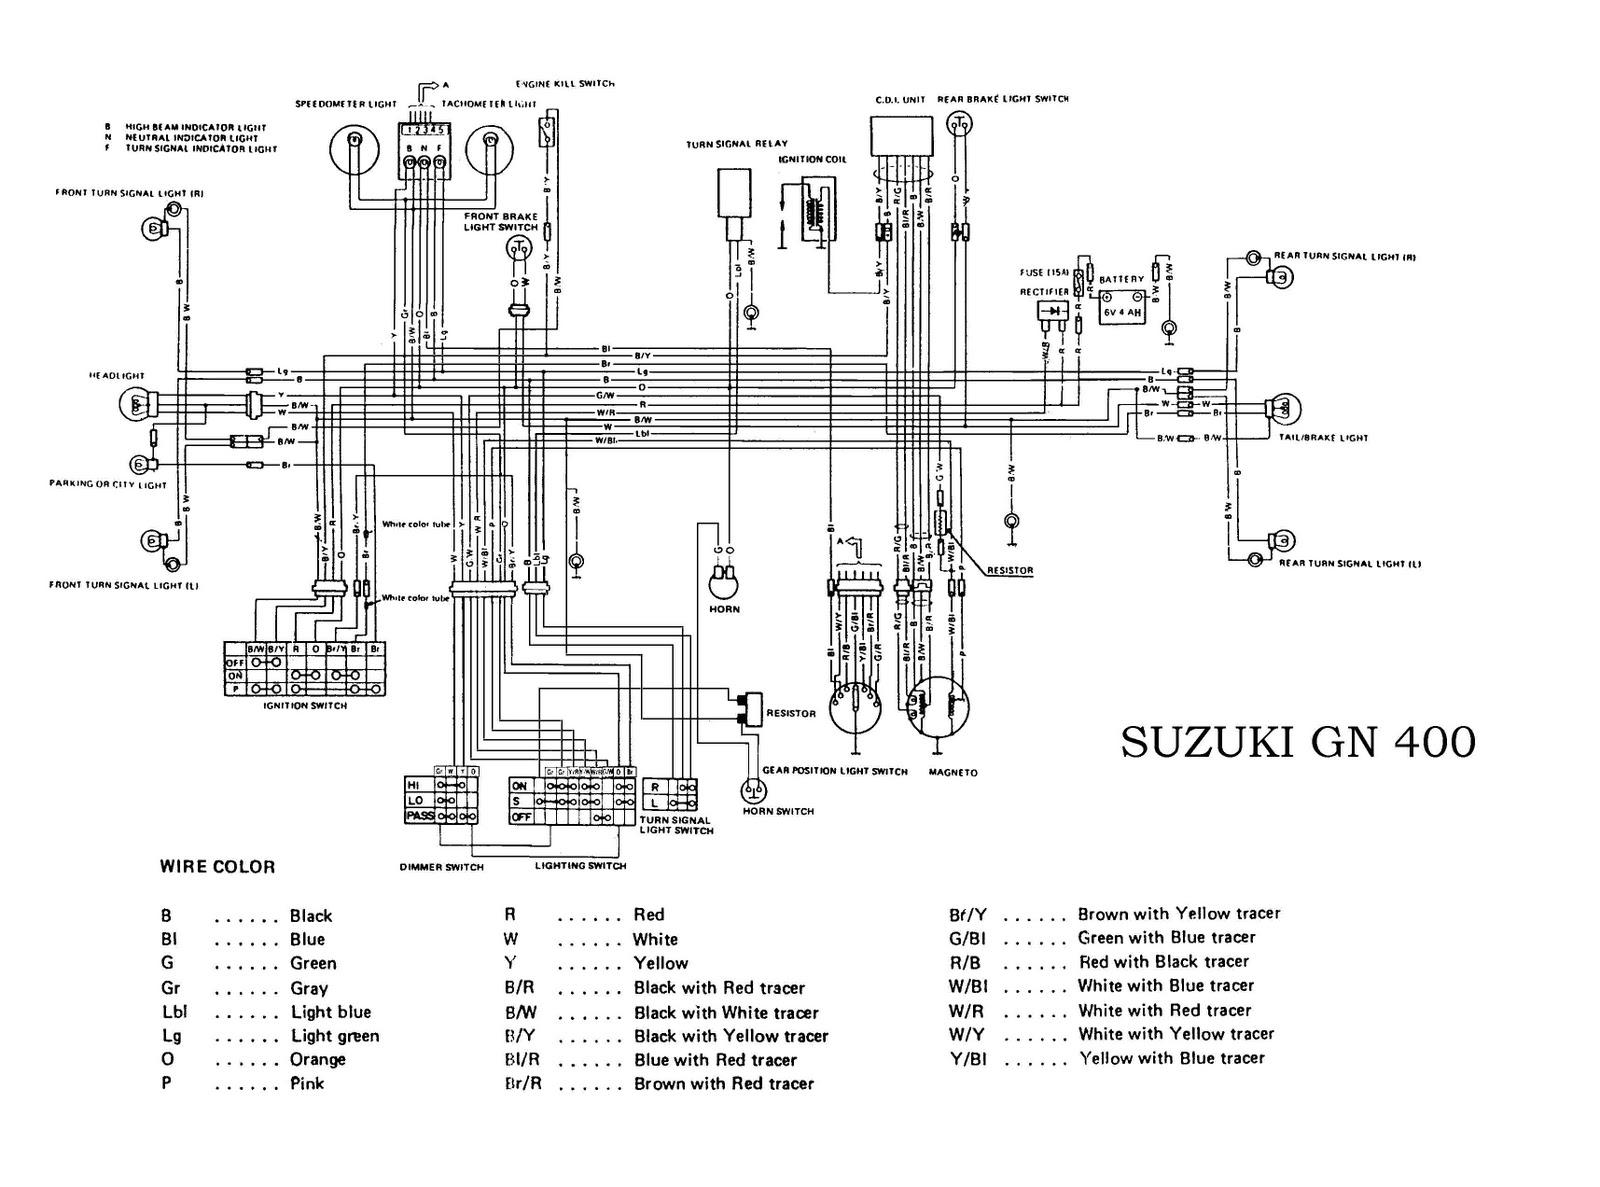 electrical wire diagrams john deere 250 skid steer alternator wiring diagram suzuki gn400 all about